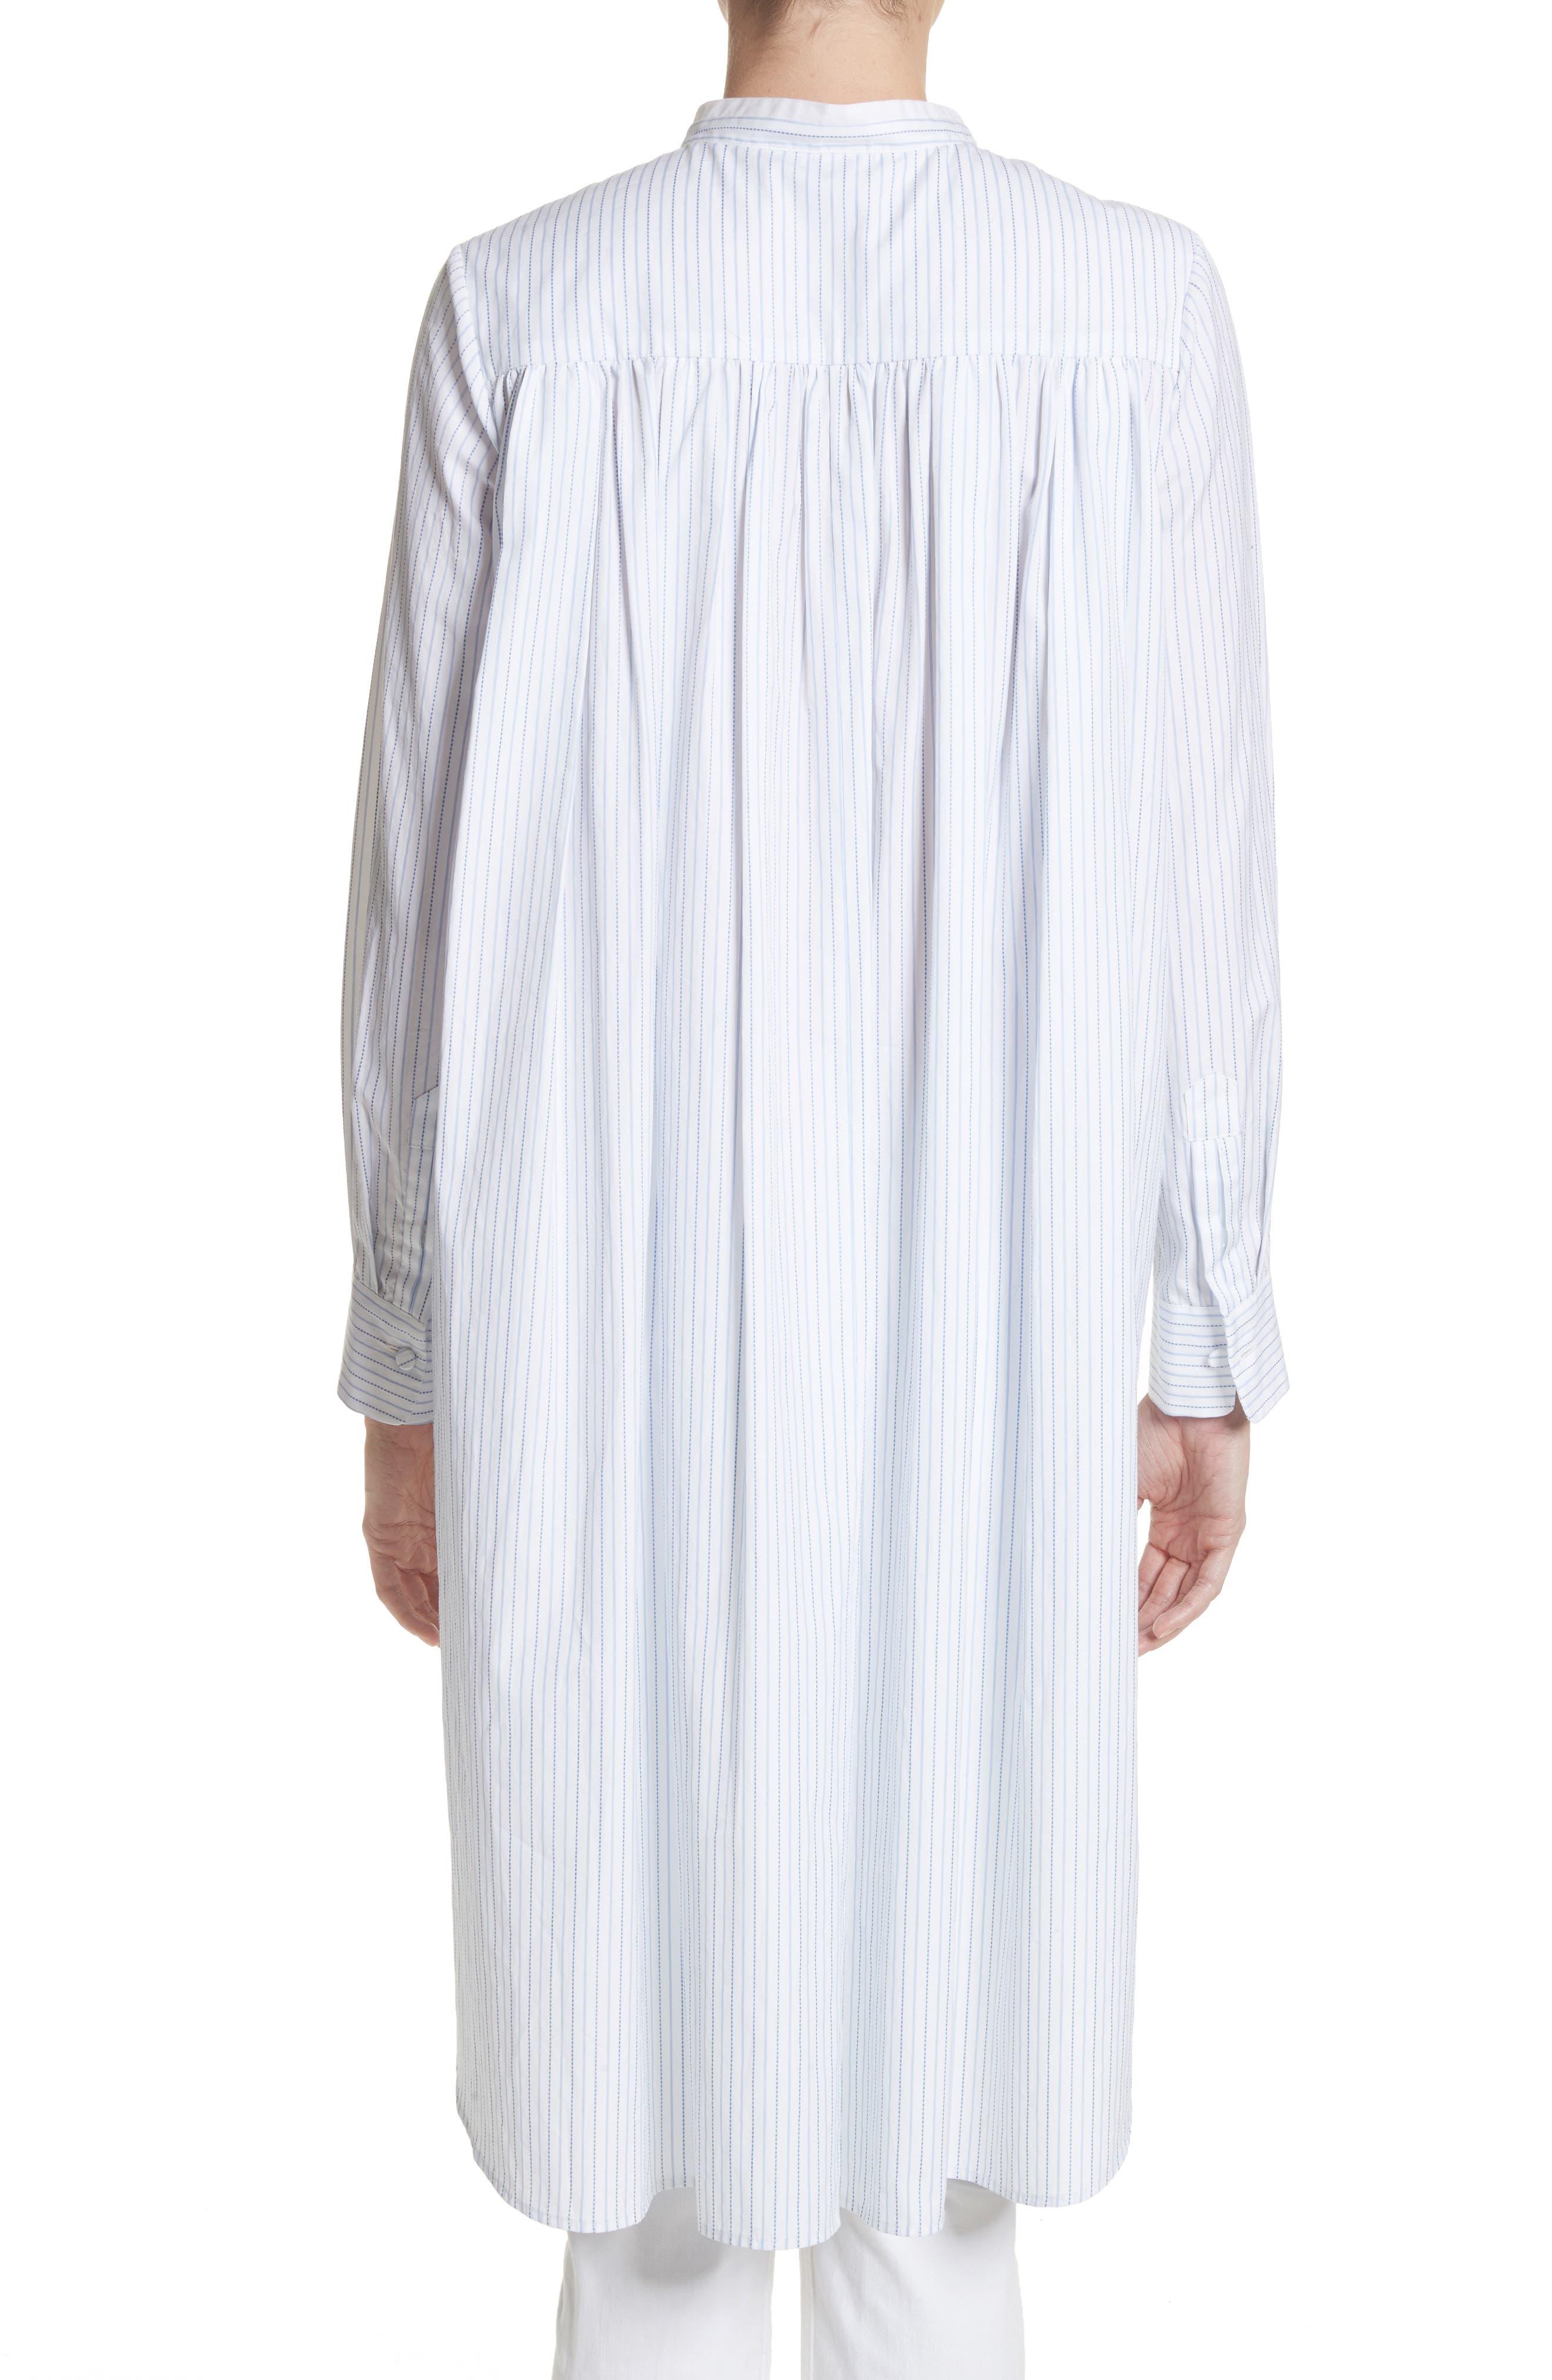 High/Low Stripe Cotton Poplin Shirt,                             Alternate thumbnail 2, color,                             White/ Blue